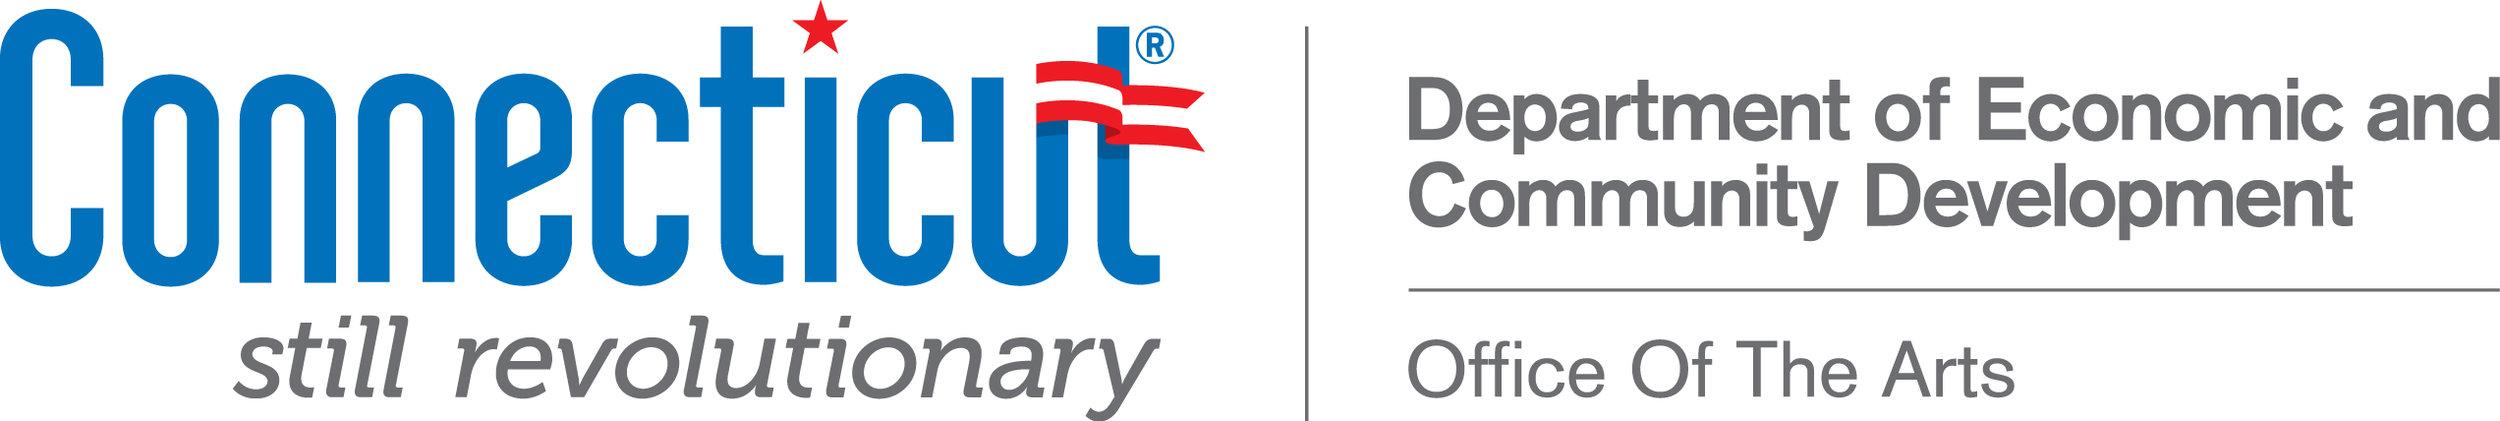 CT-Logo-DECD-Left-OOTA-RGB_R.jpg